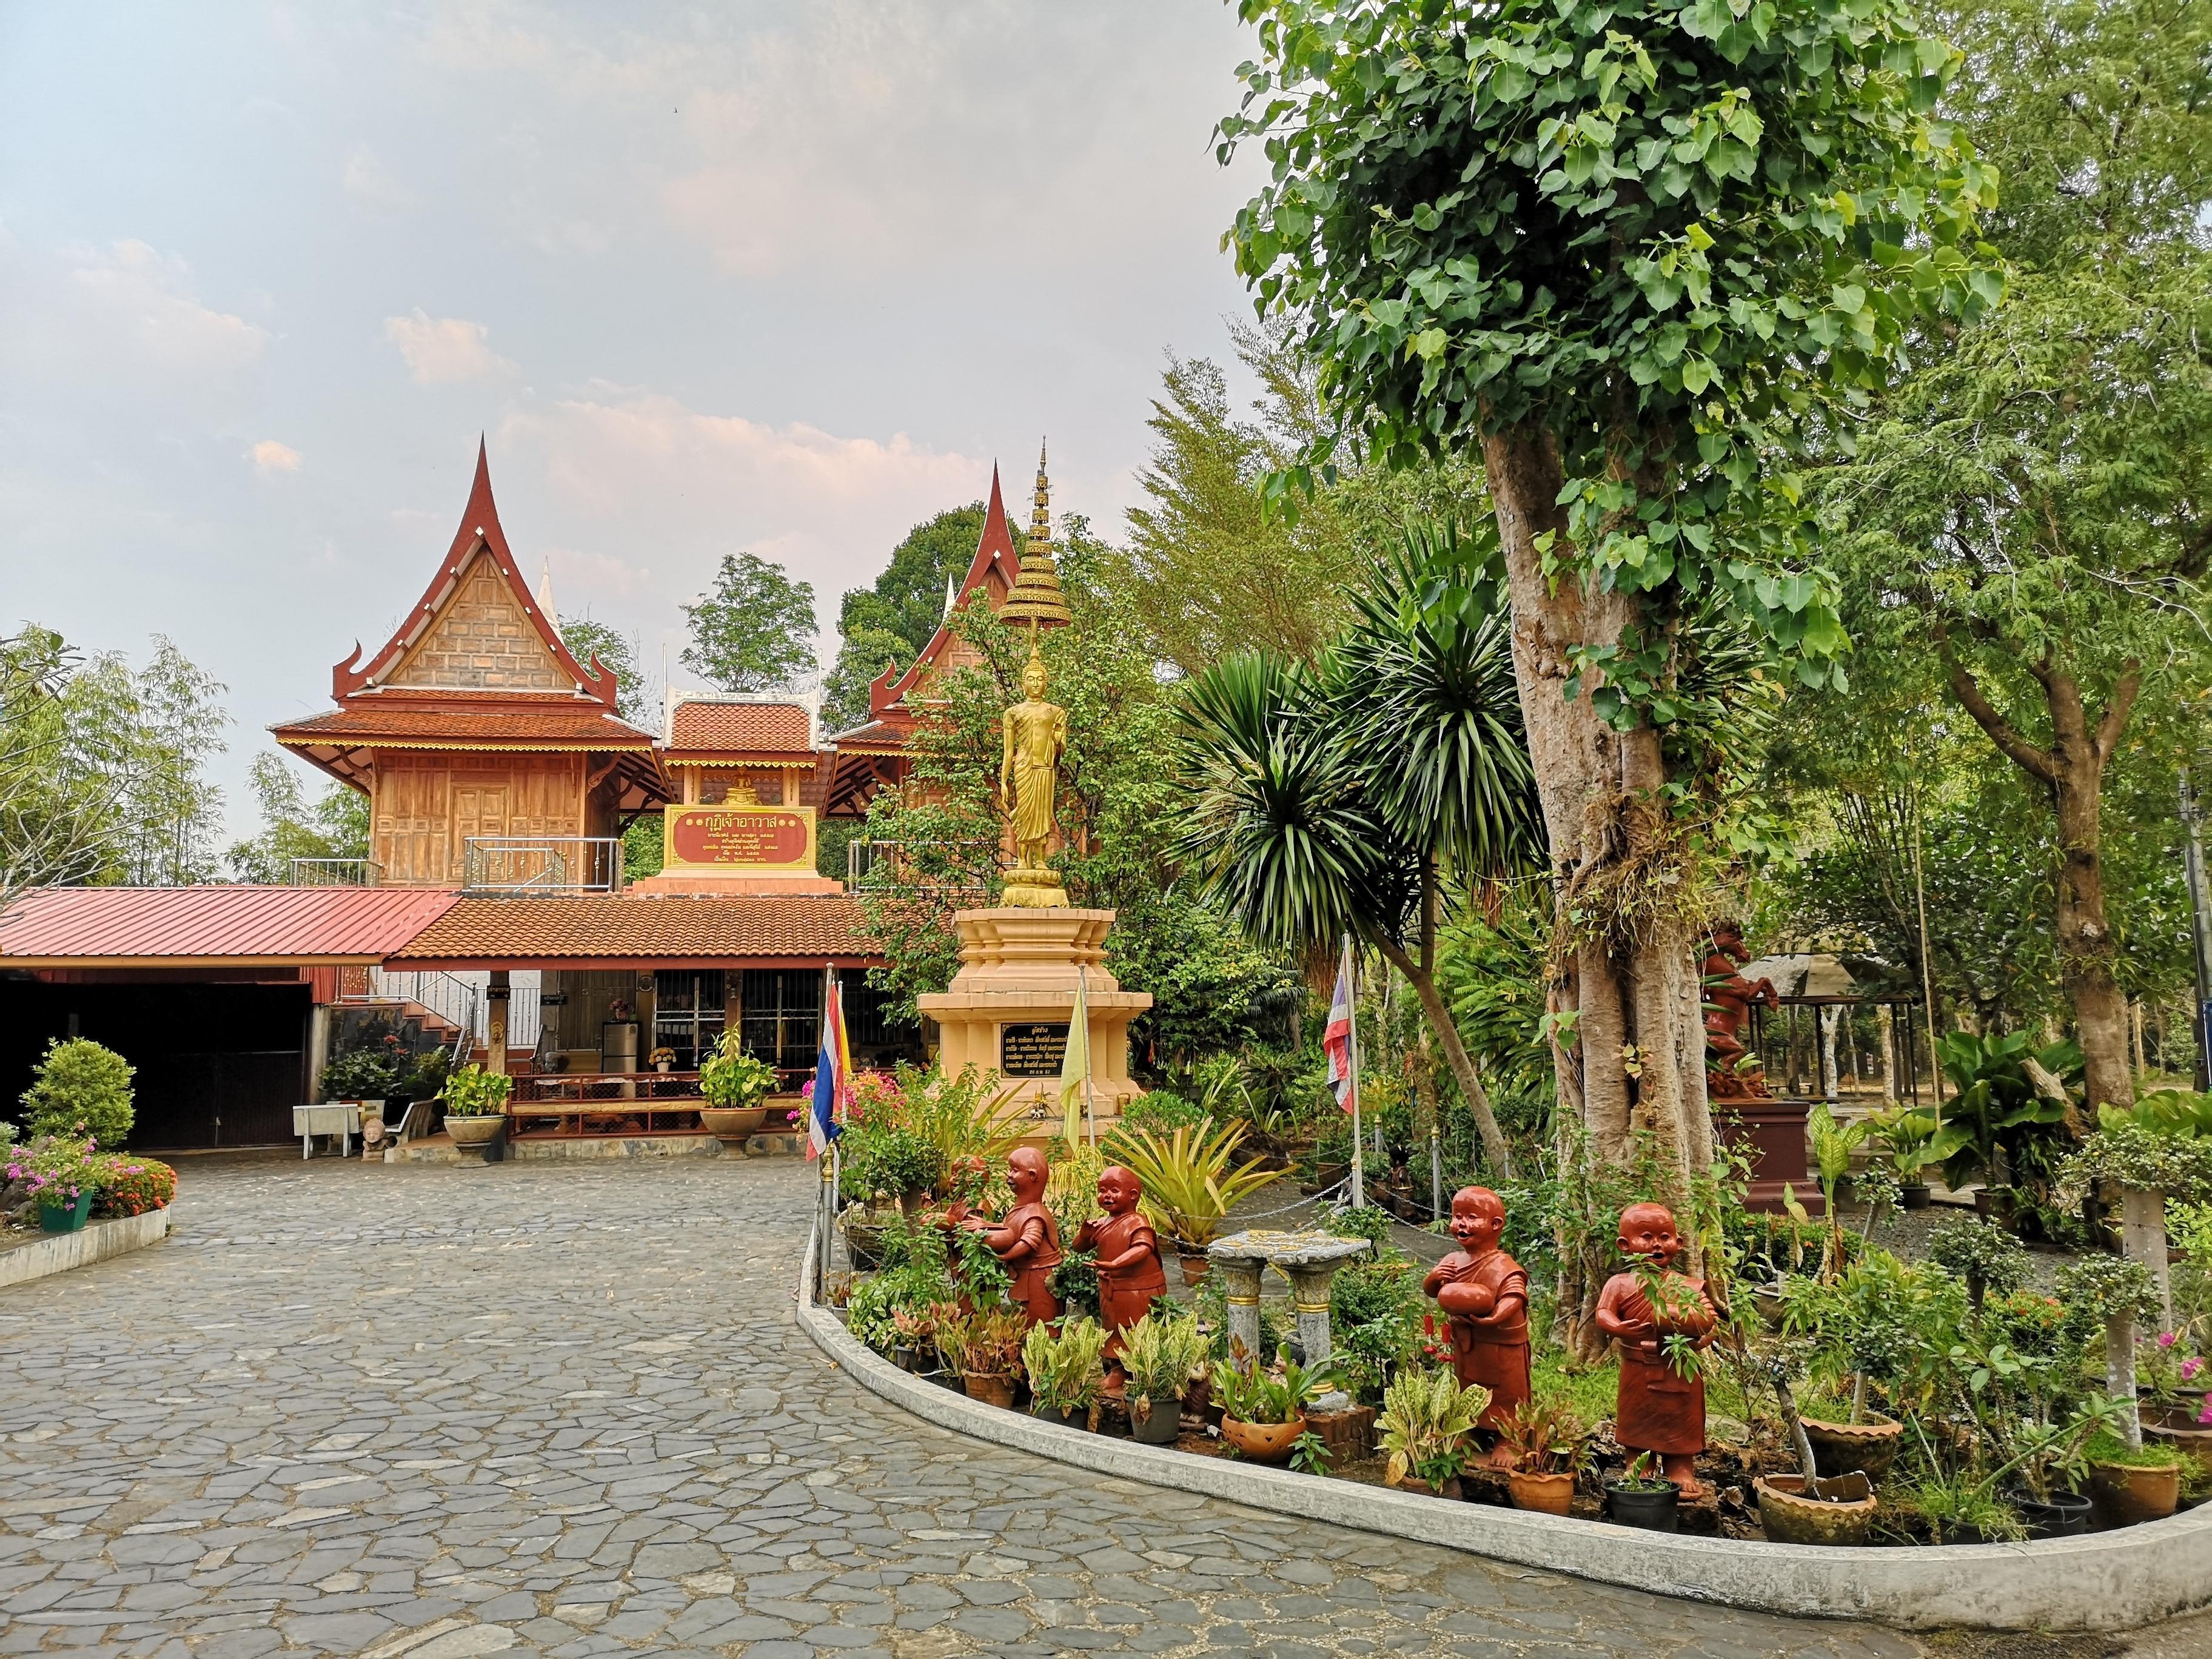 Wat Buppharam temple in Trat, Thailand